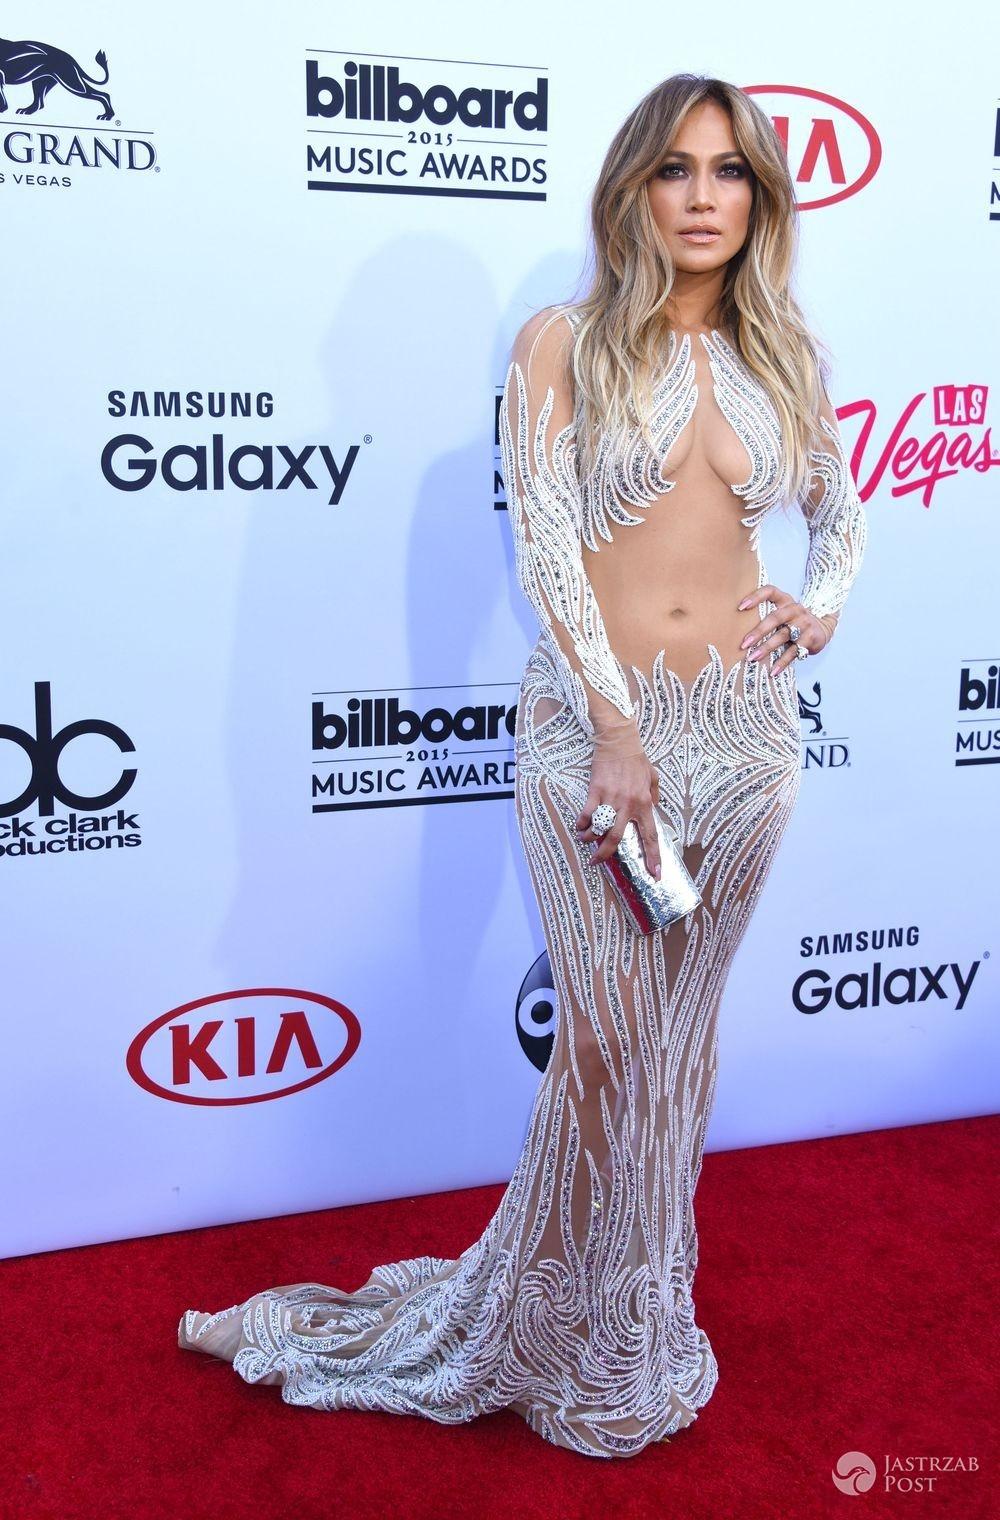 Jennifer Lopez na Billboard Music Awards 2015 w kreacji Charbel Zoe (fot. ONS)